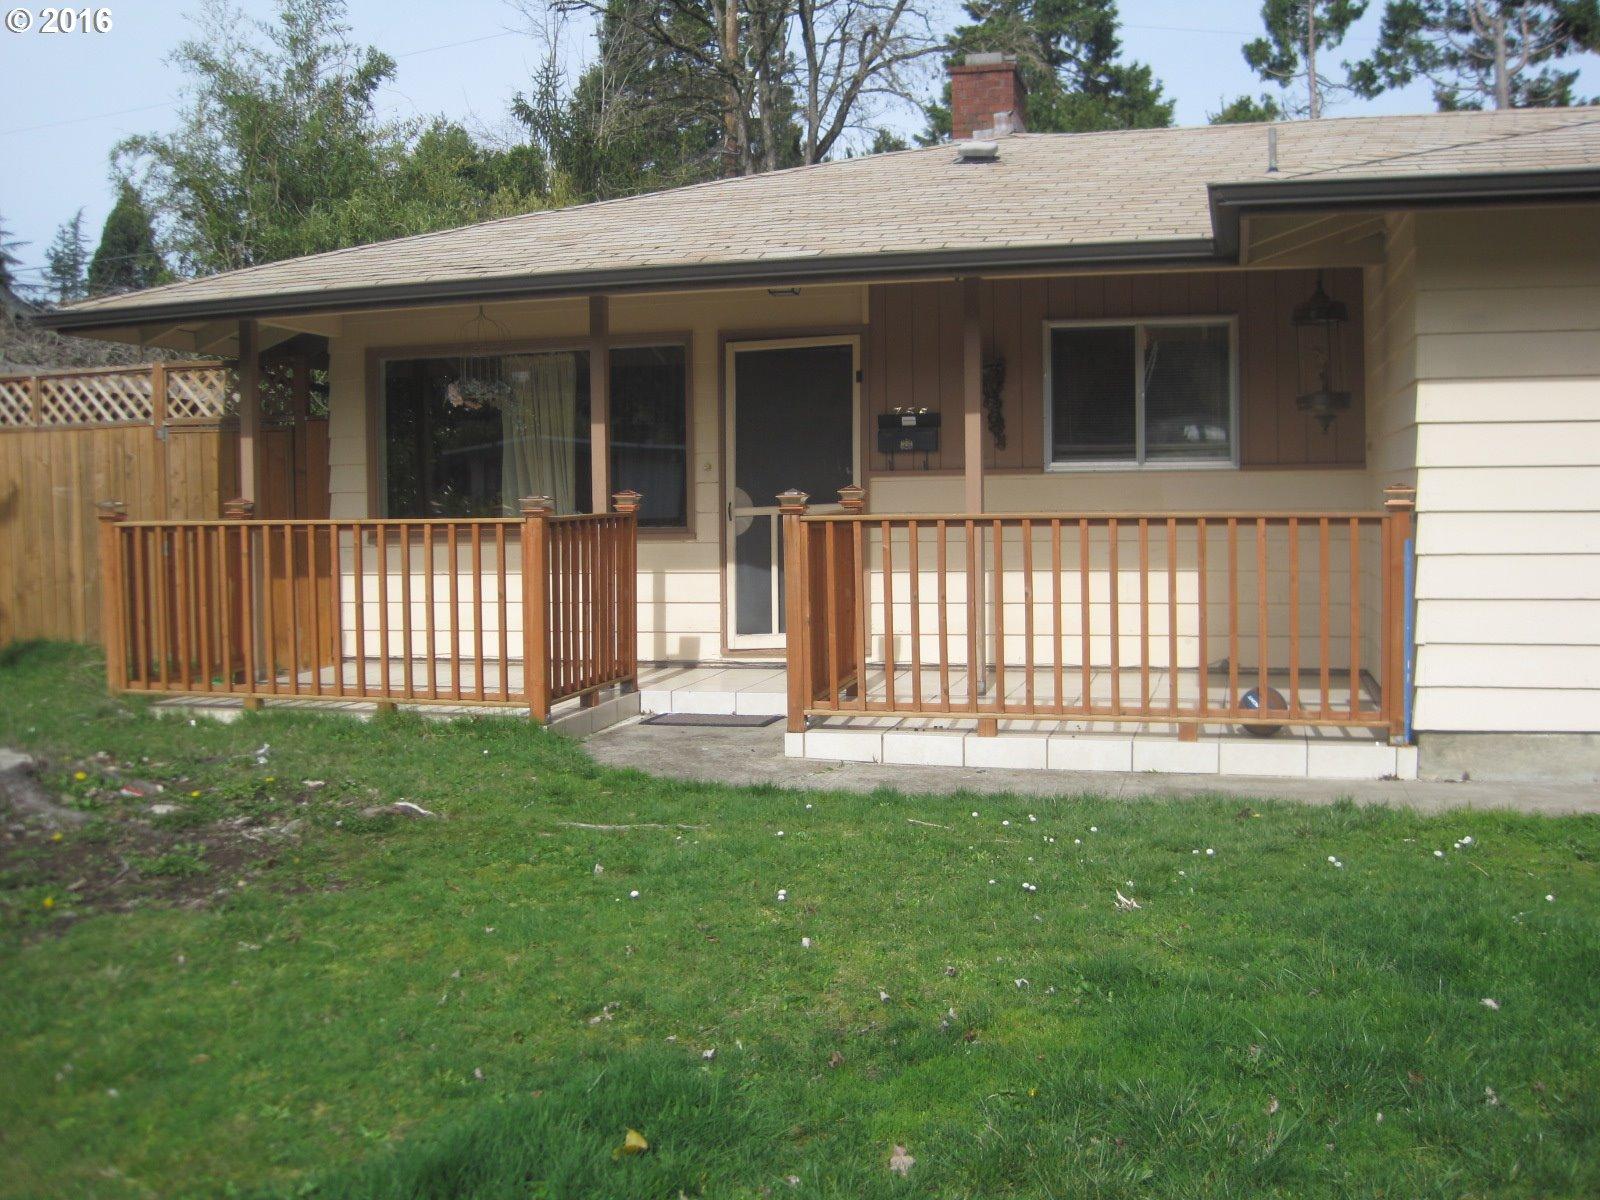 755 e 36th pl eugene or 97405 us eugene home for sale